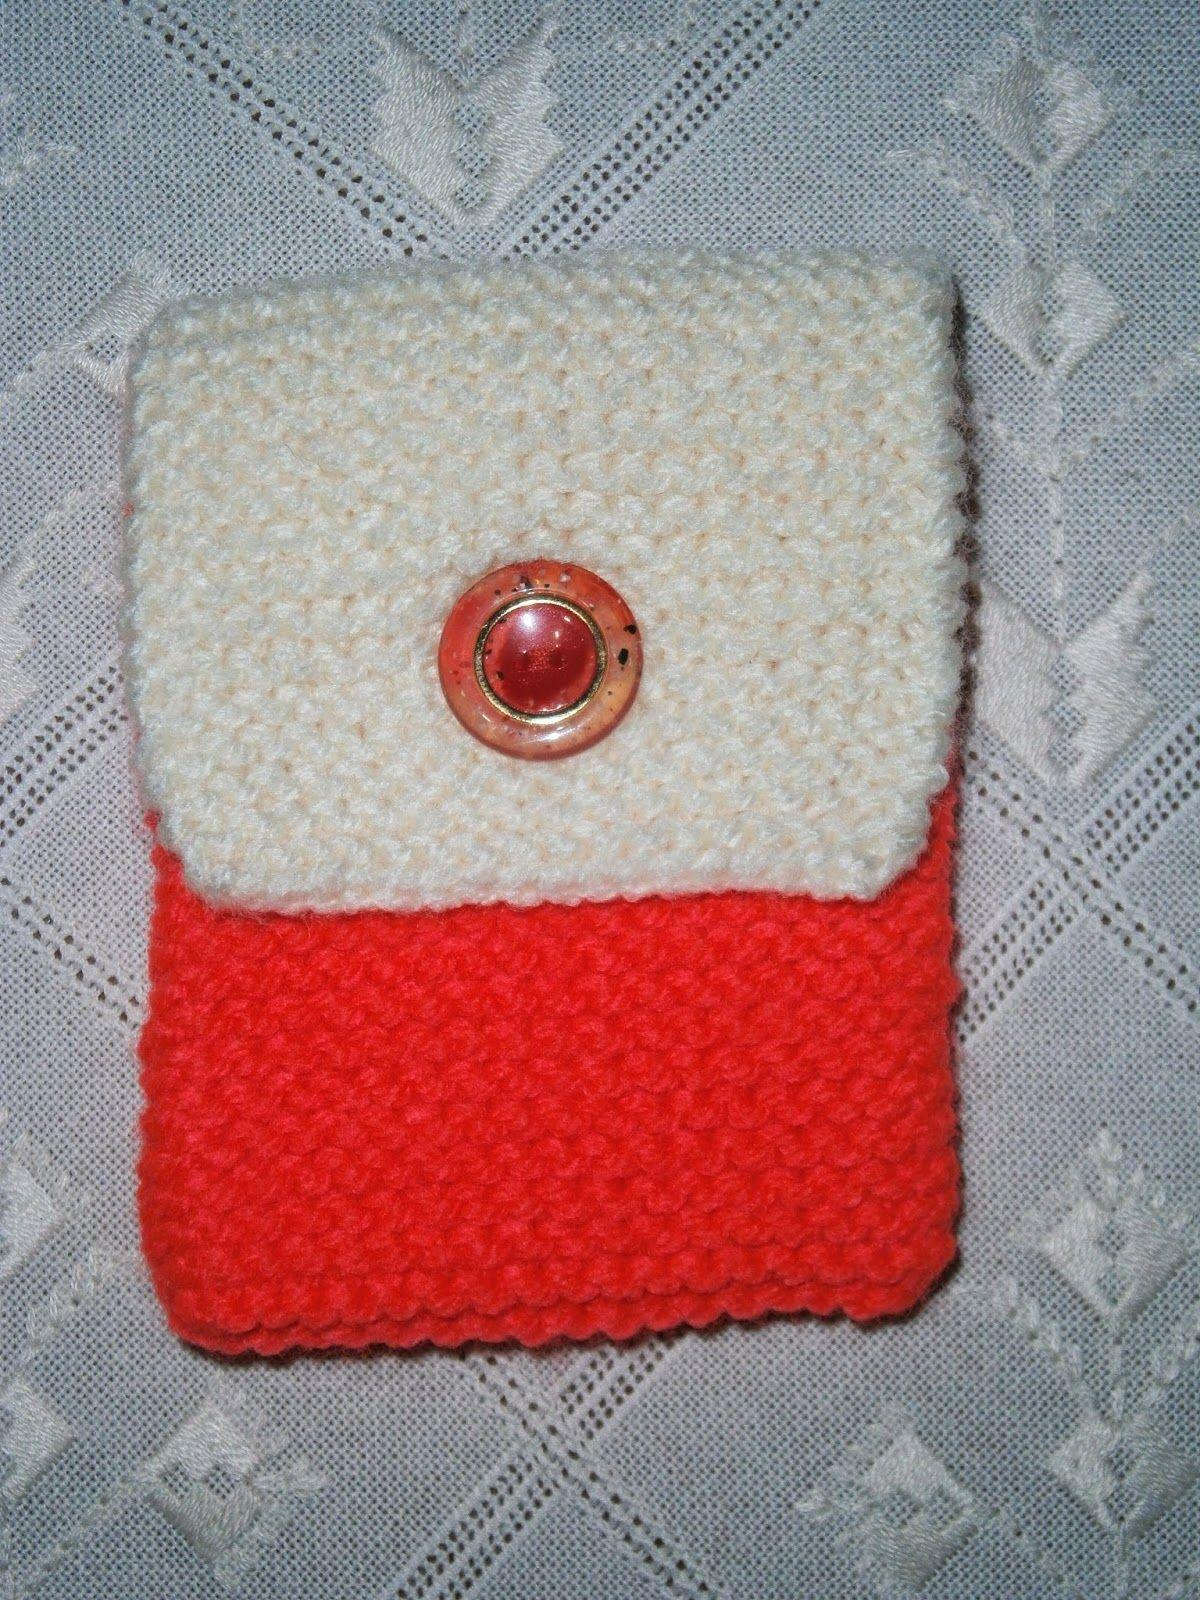 Lia B. Creations  Candy crush woollen pouch   Knitting   Crocheting ... 405f928b40f